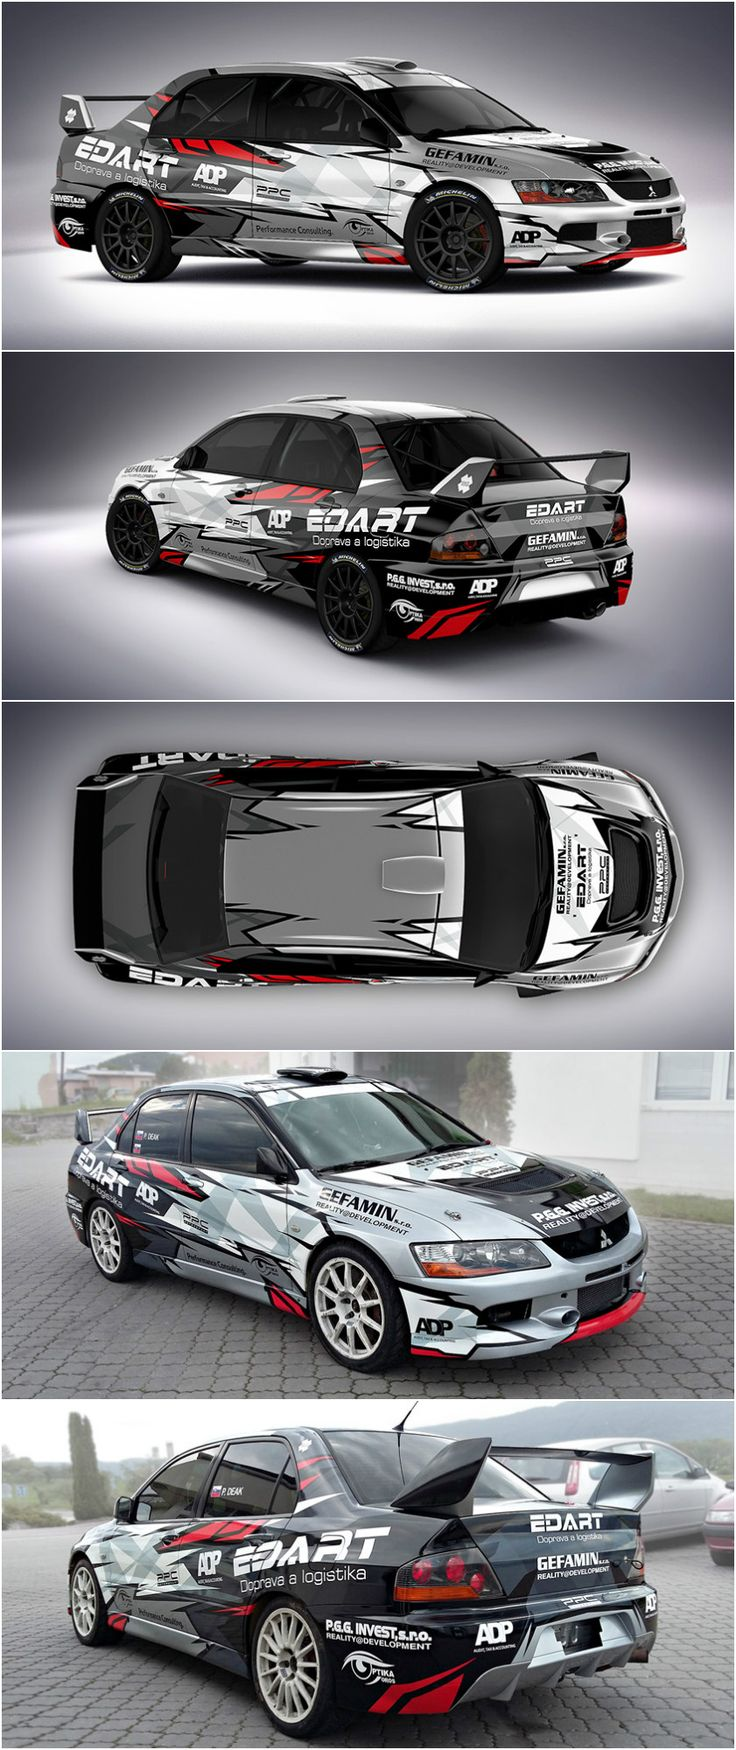 Design and wrap of Mitsubishi Lancer Evo IX for Slovak Xiqio Racing team